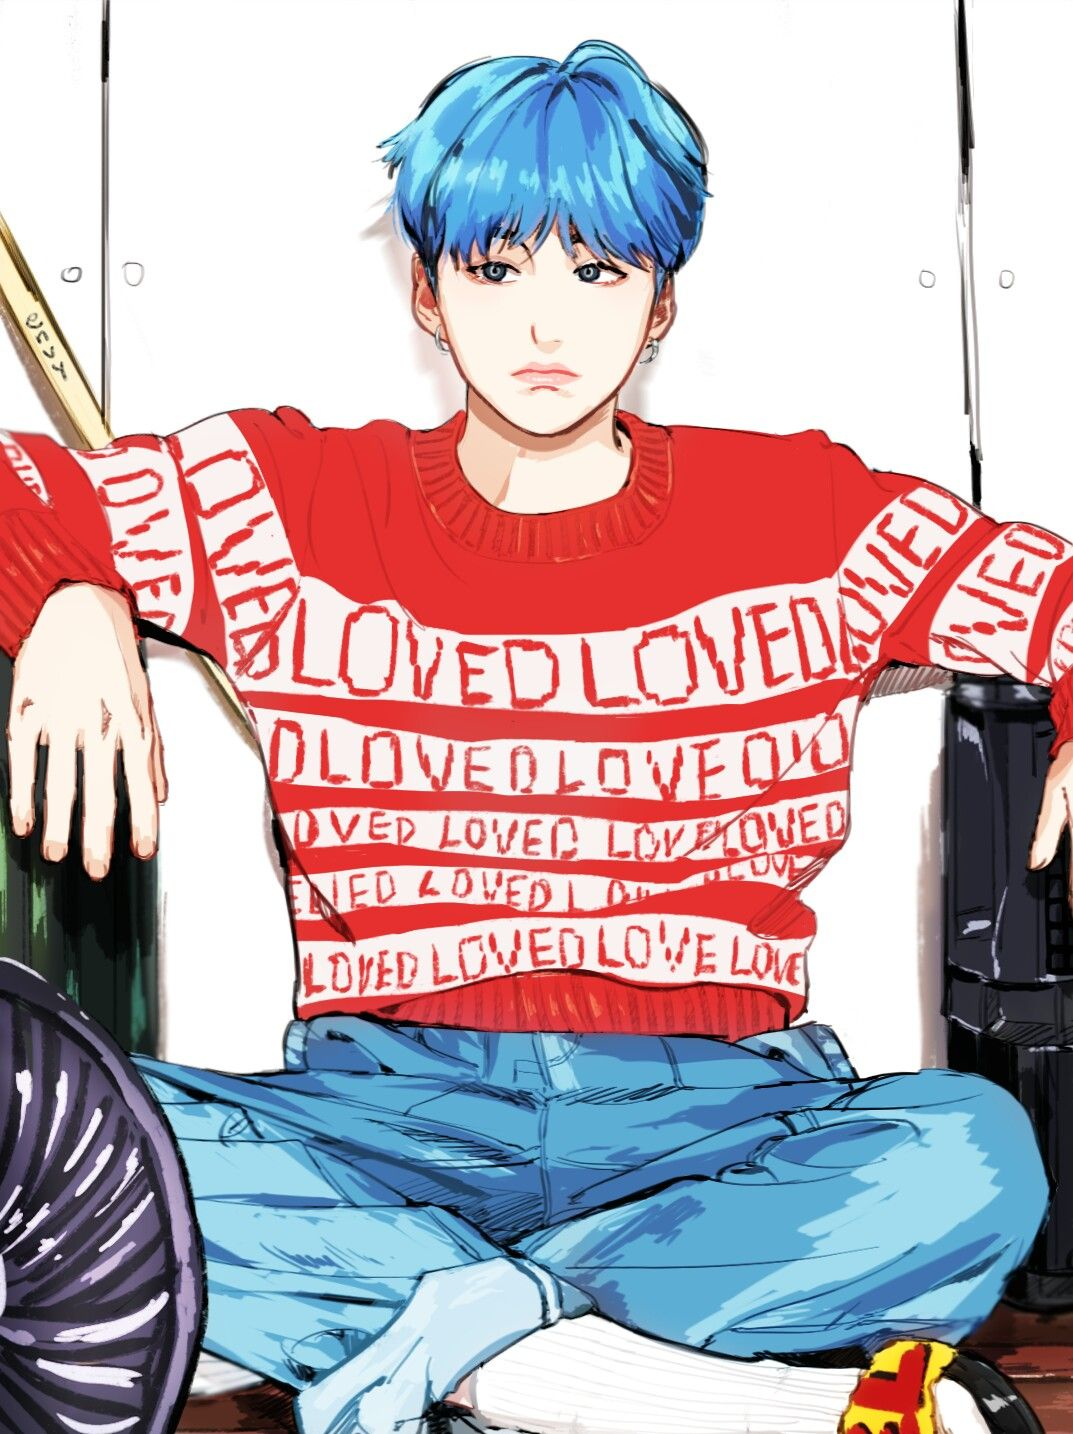 Yoongi Bts fanart ♡ FanArt Pinterest Yoongi bts